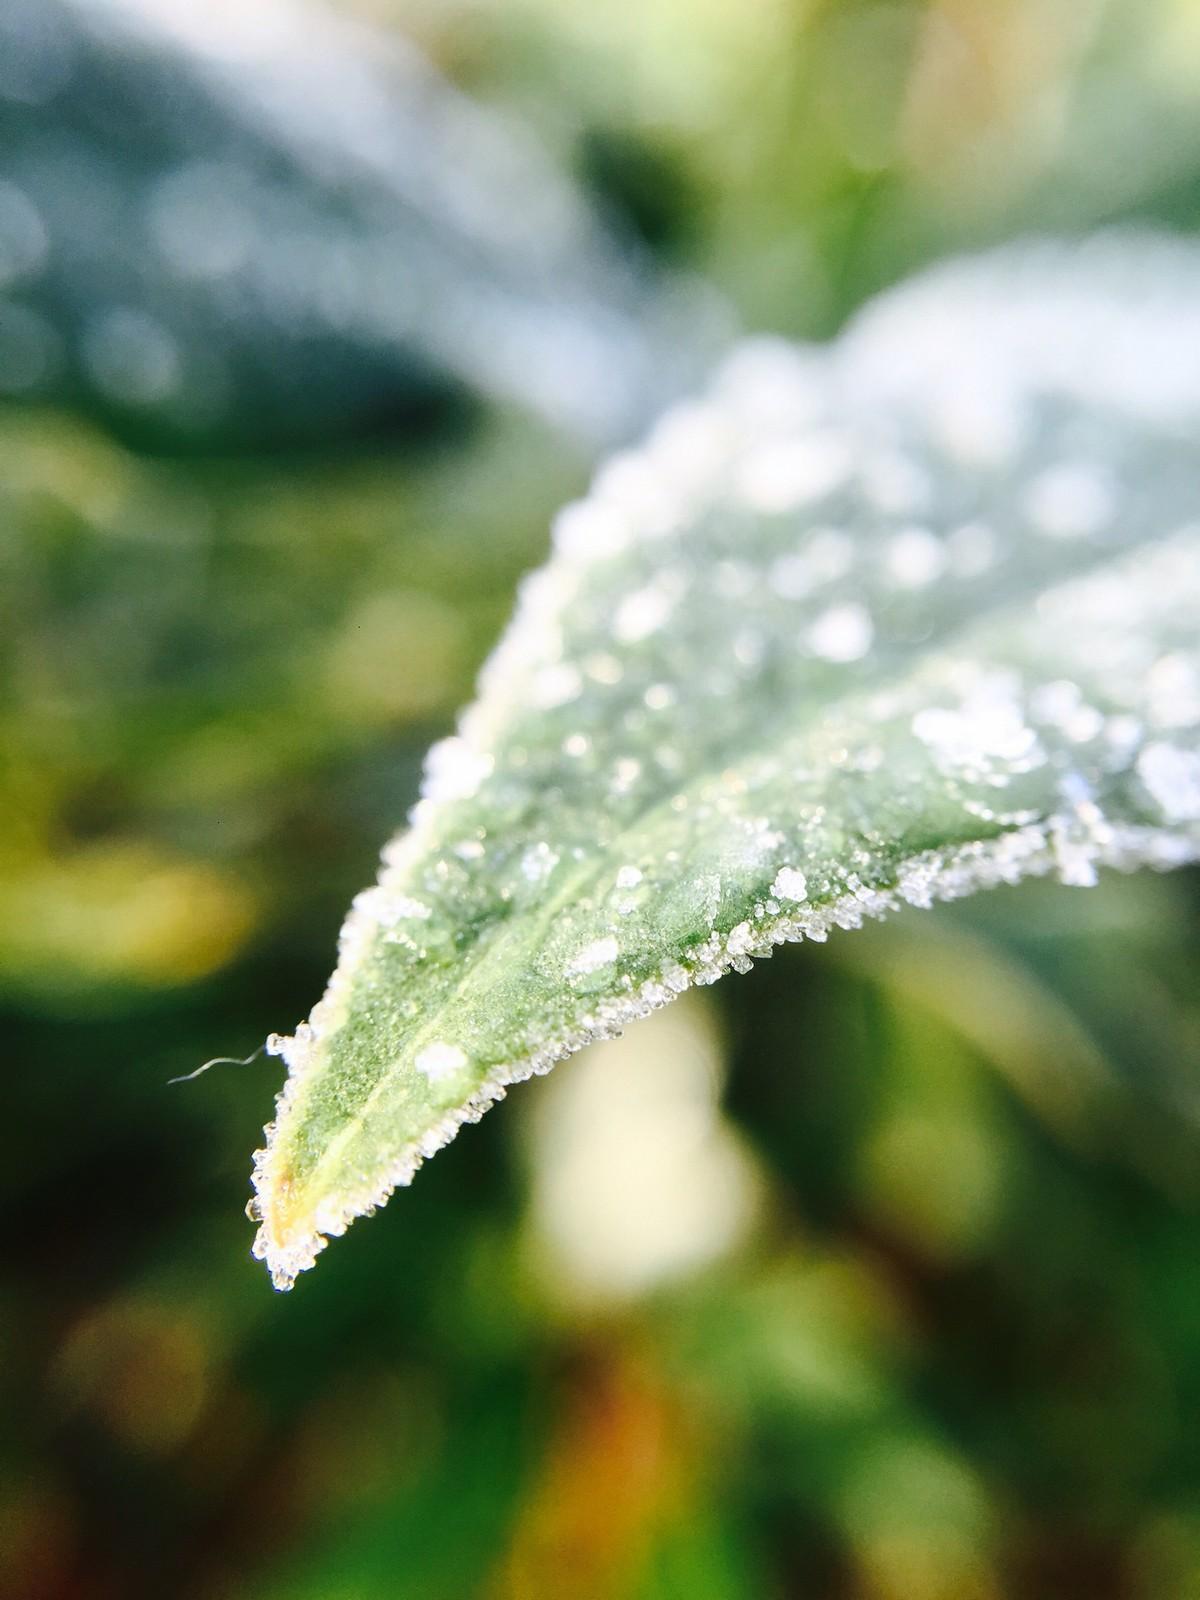 Bidrag 24 – Små, små vattendroppar på ett löv